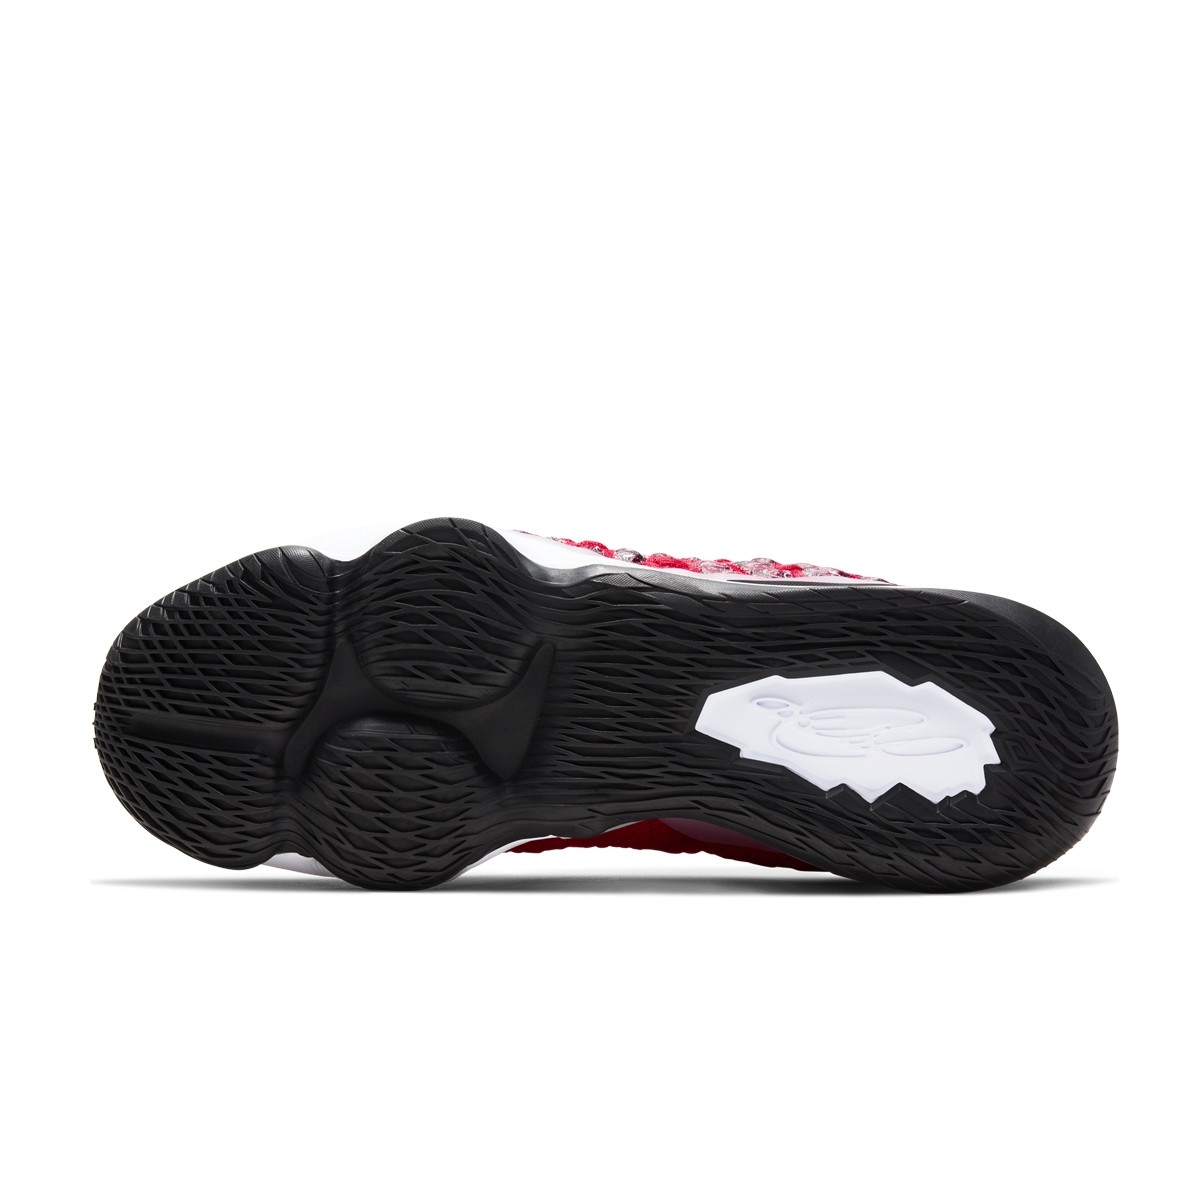 Nike Lebron XVII 'Uptempo' BQ3177-601